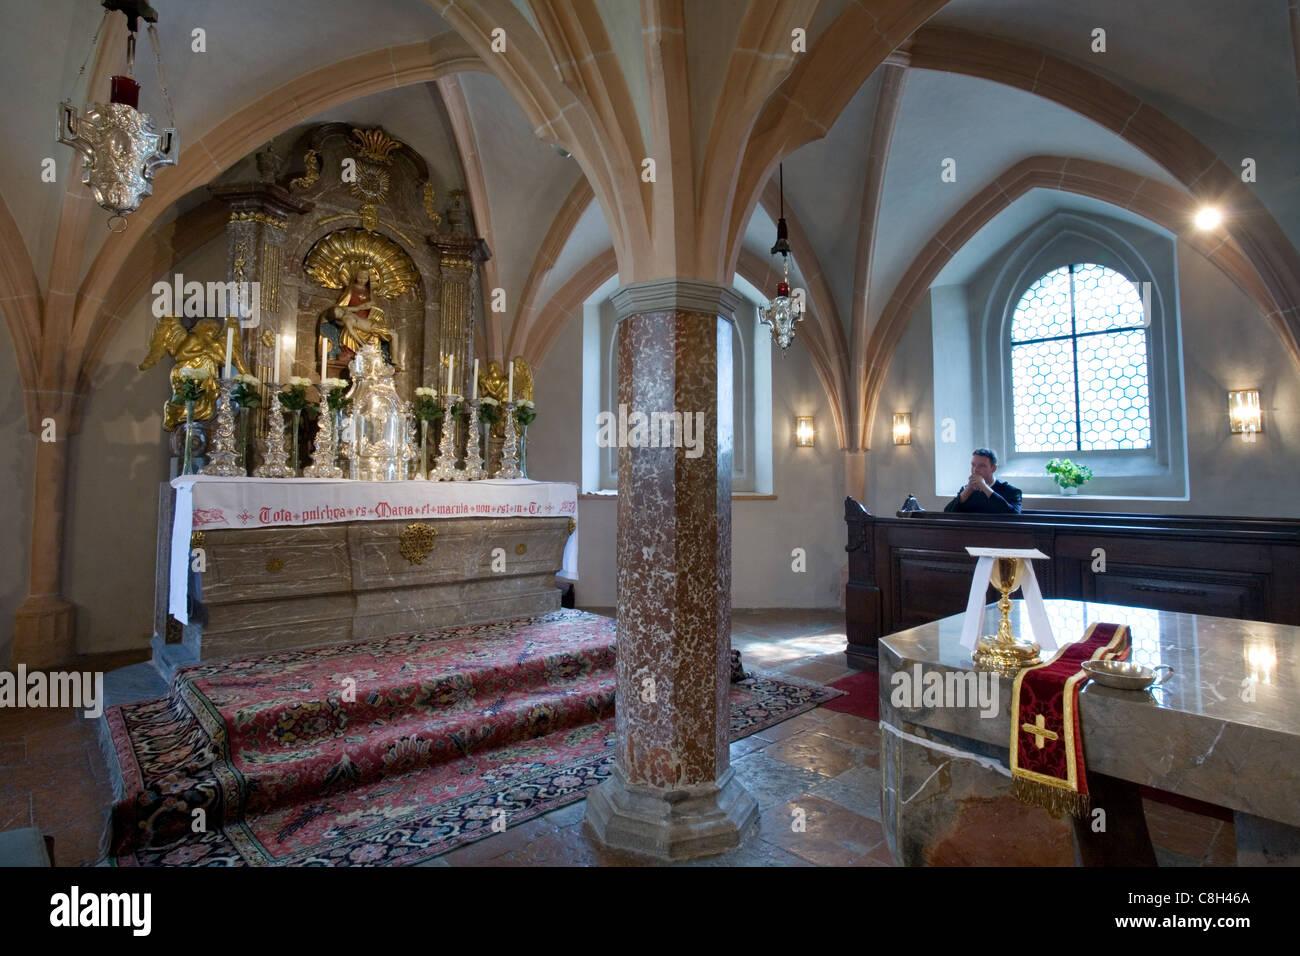 Chalice in the Göttweig Abbey Chapel, Austria - Stock Image